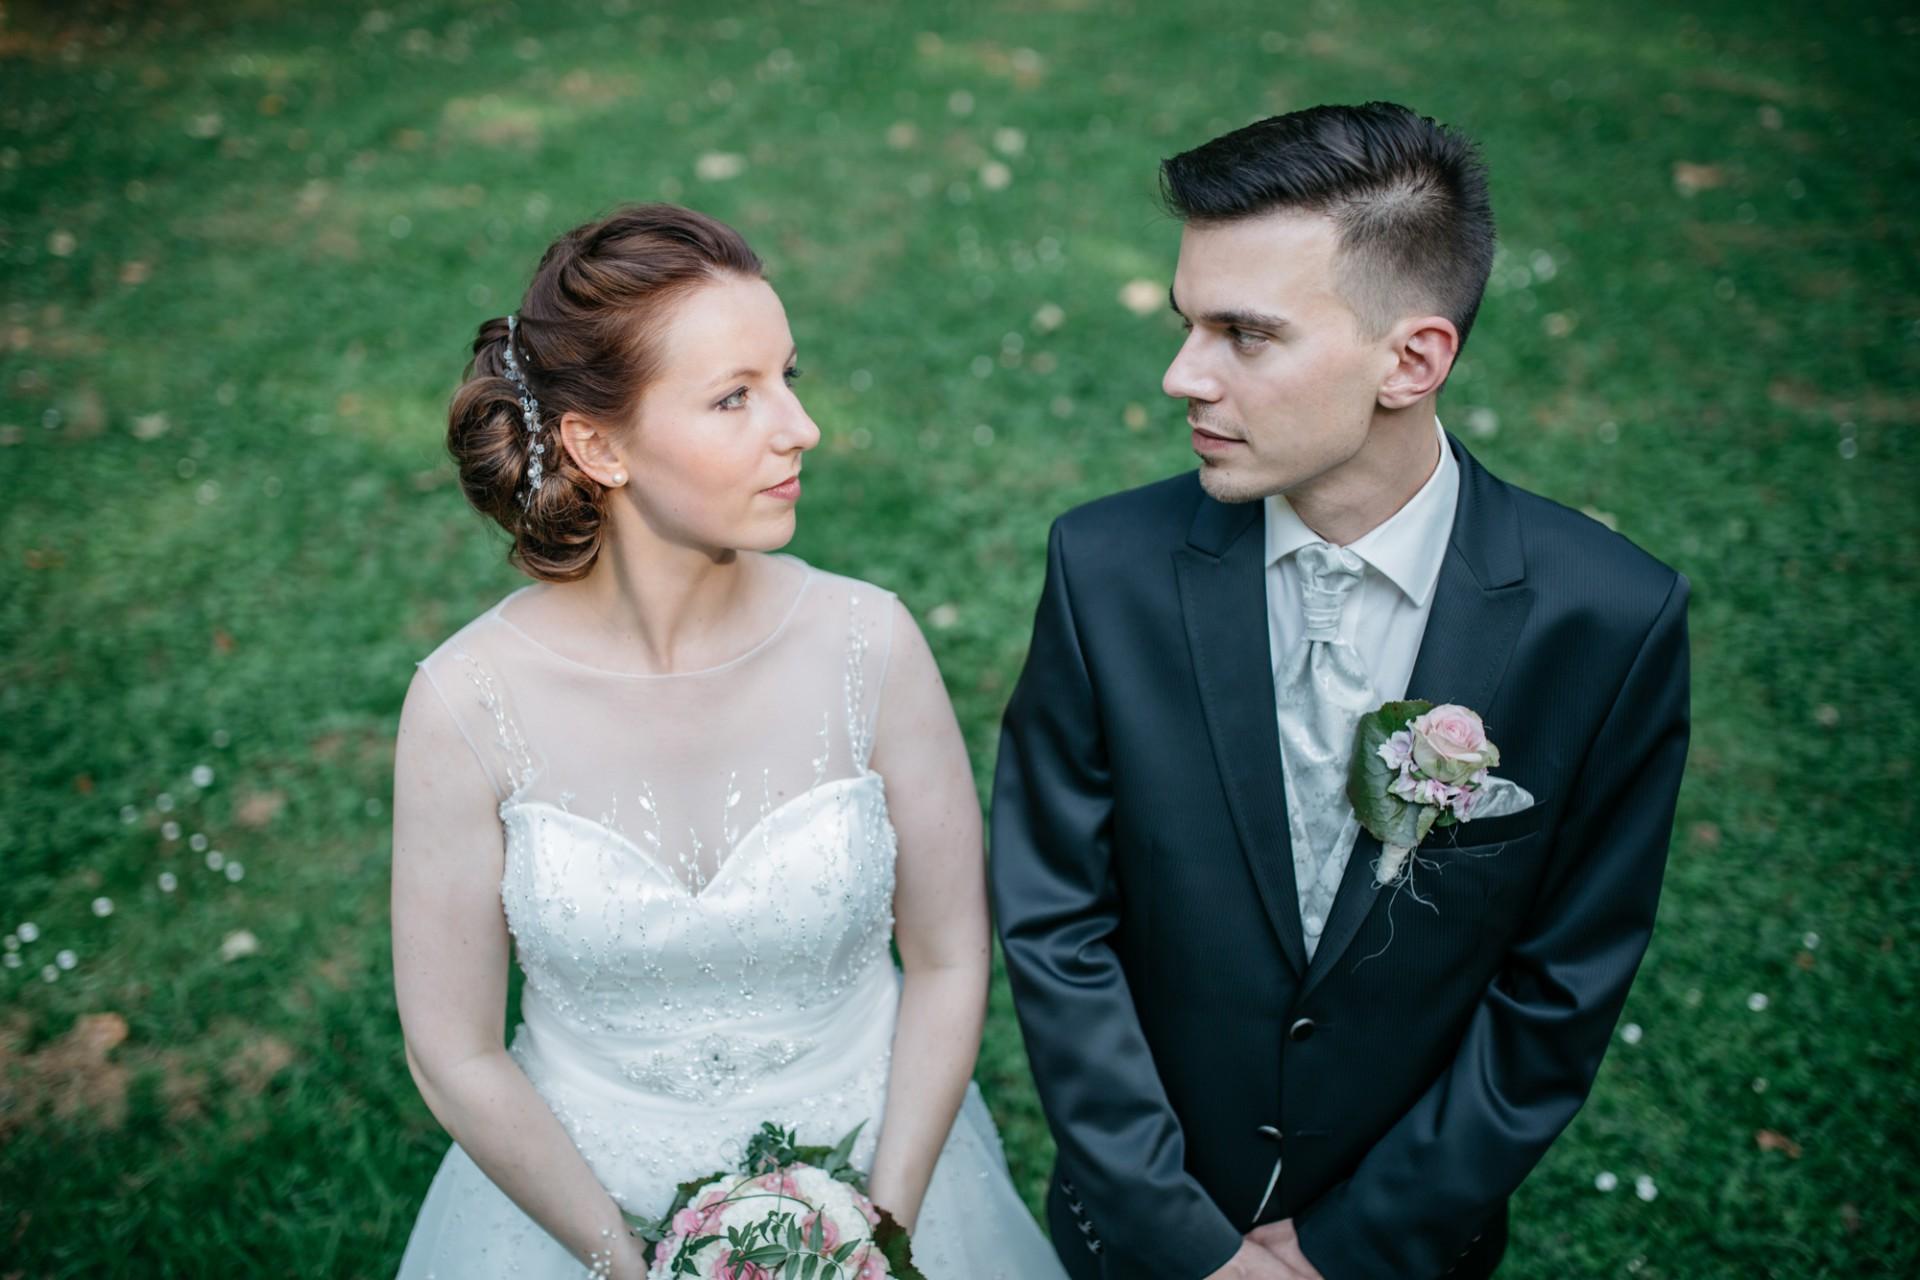 Janina & Markus